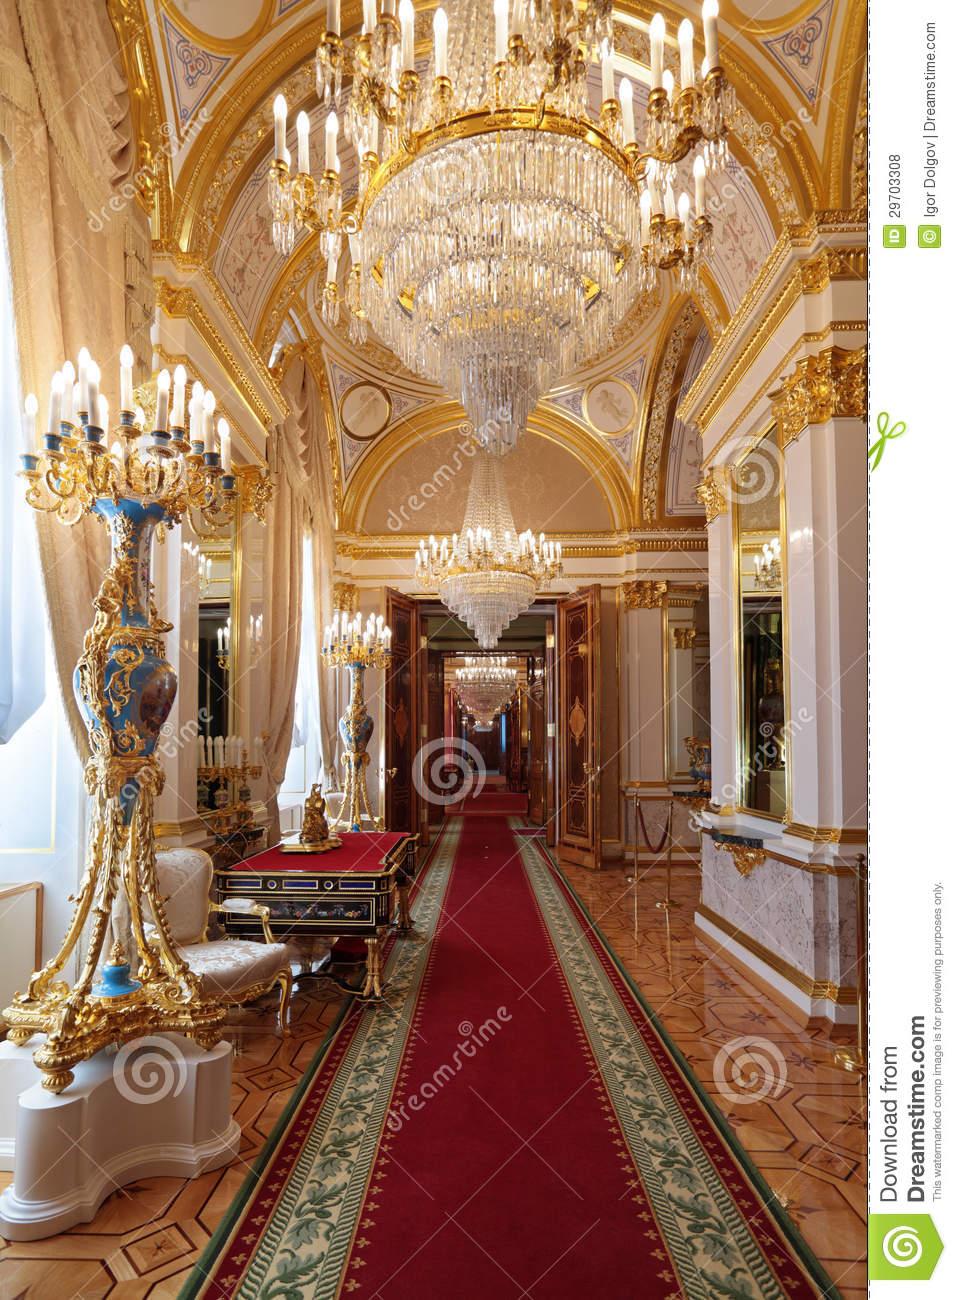 Grand kremlin palace clipart #17